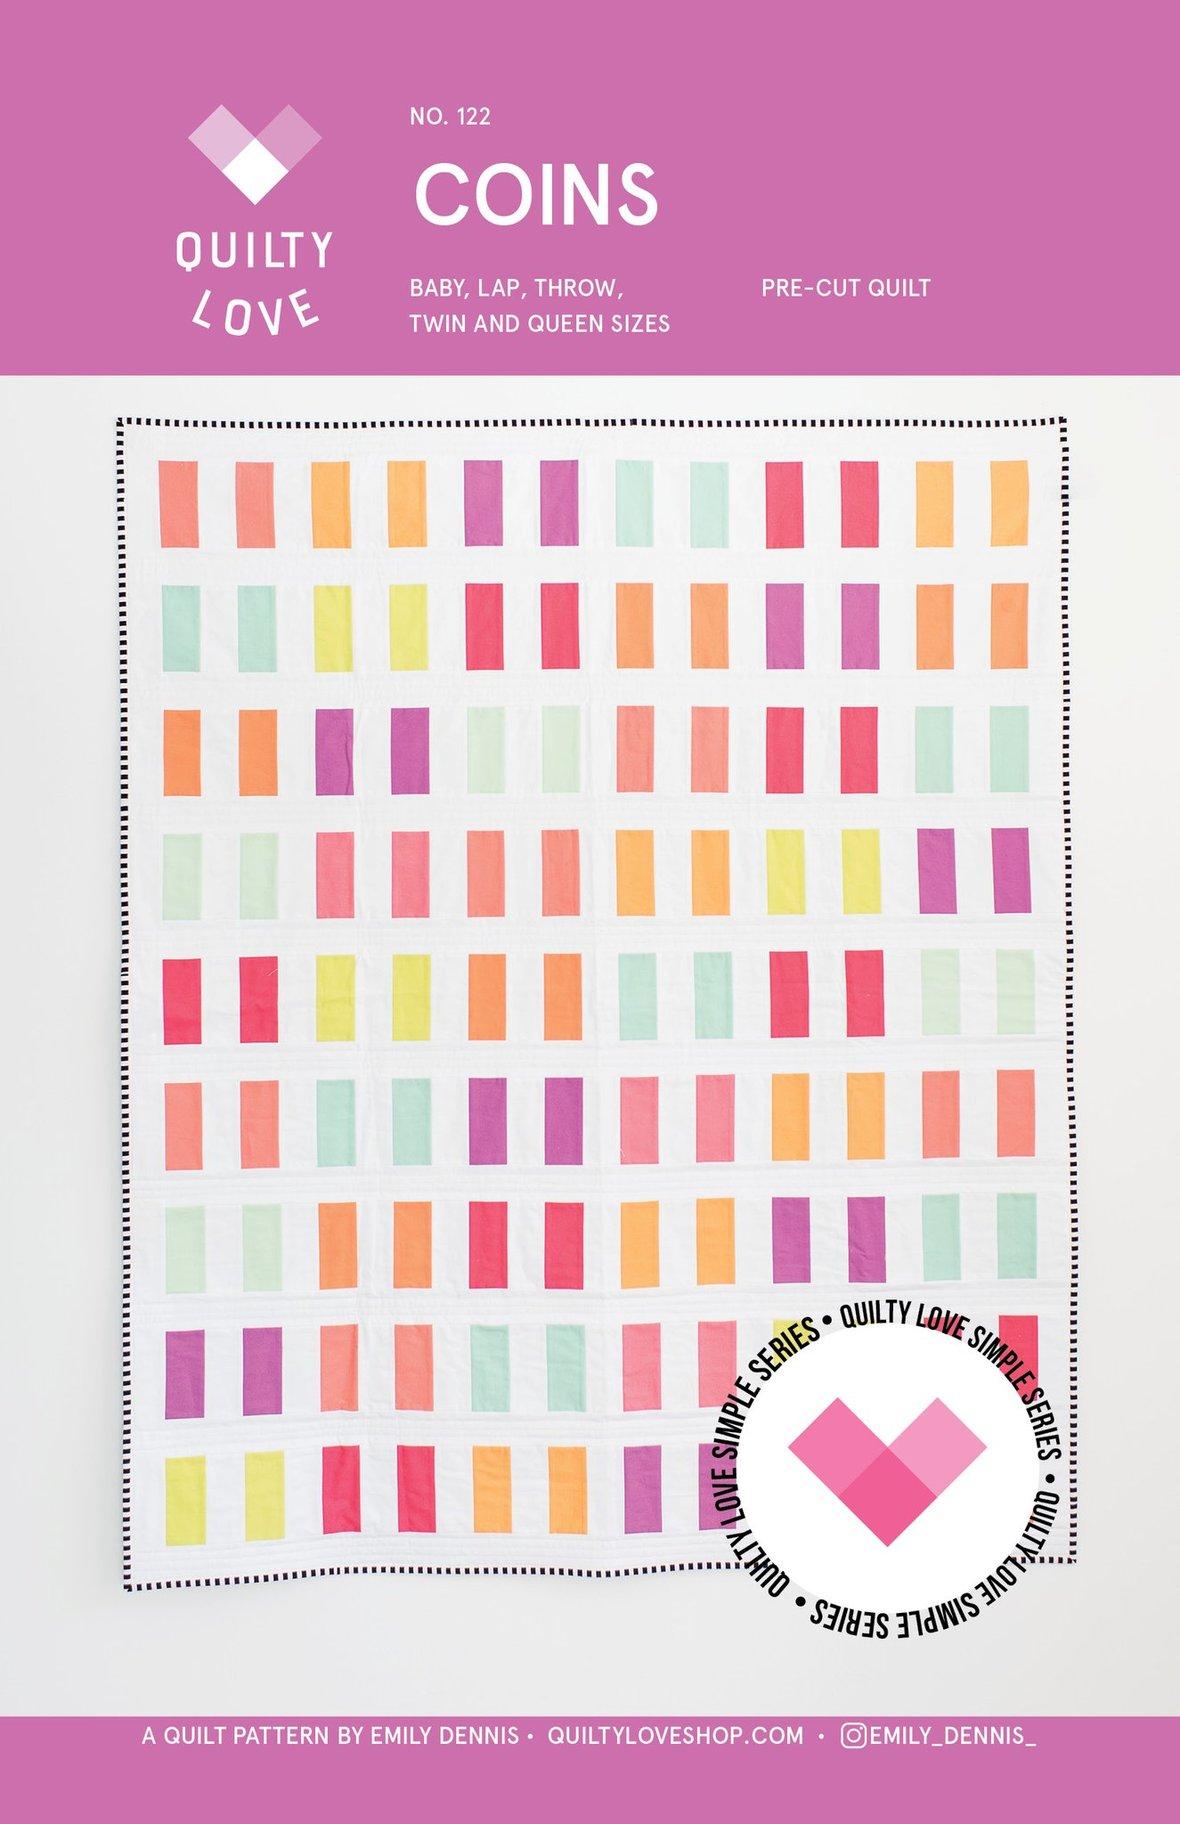 Coins Quilt PAPER Pattern 1024x1024 2x